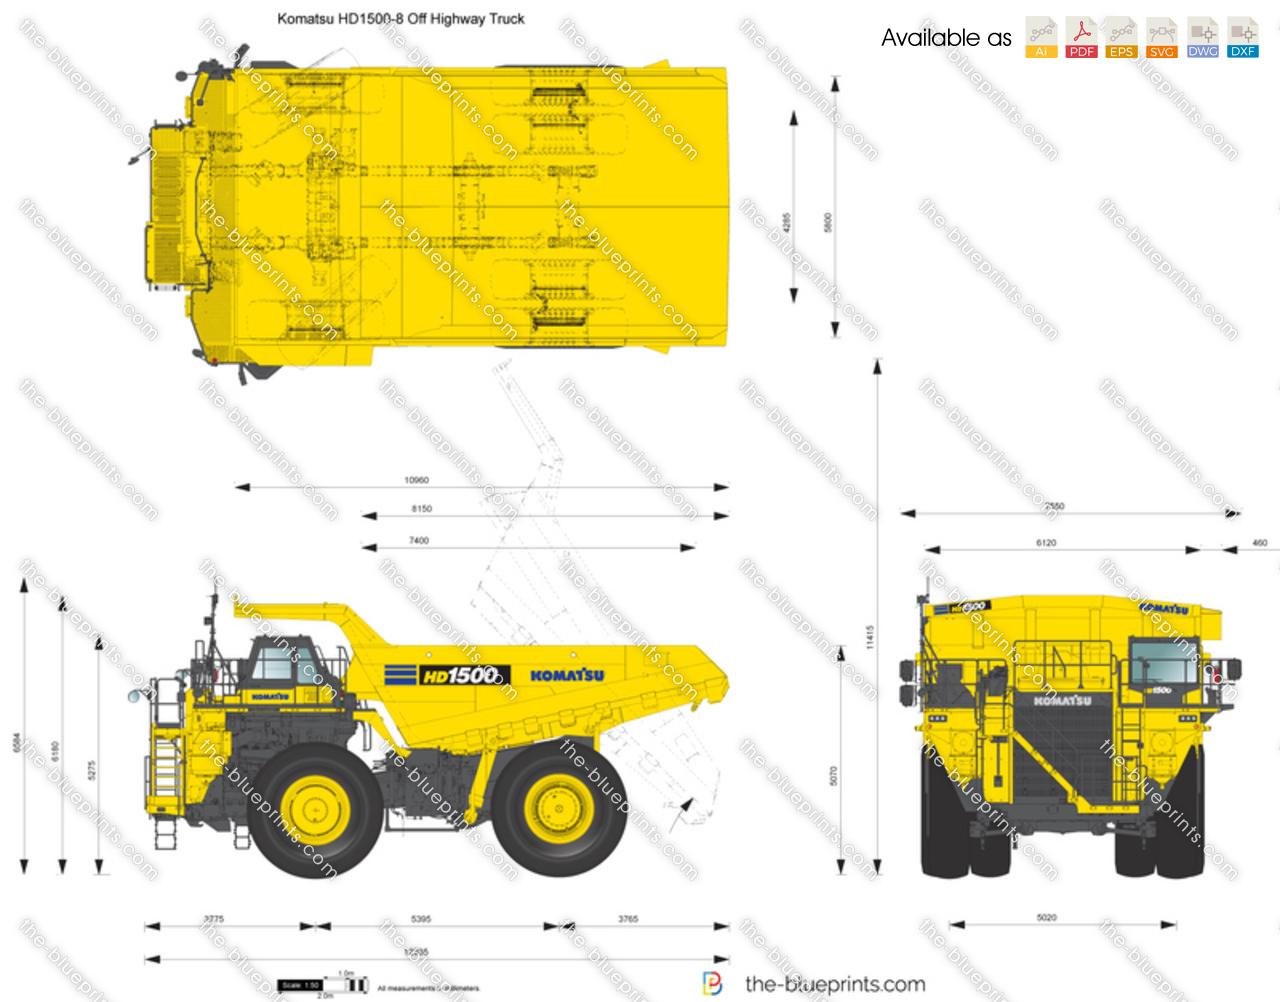 Komatsu HD1500-8 Off Highway Truck